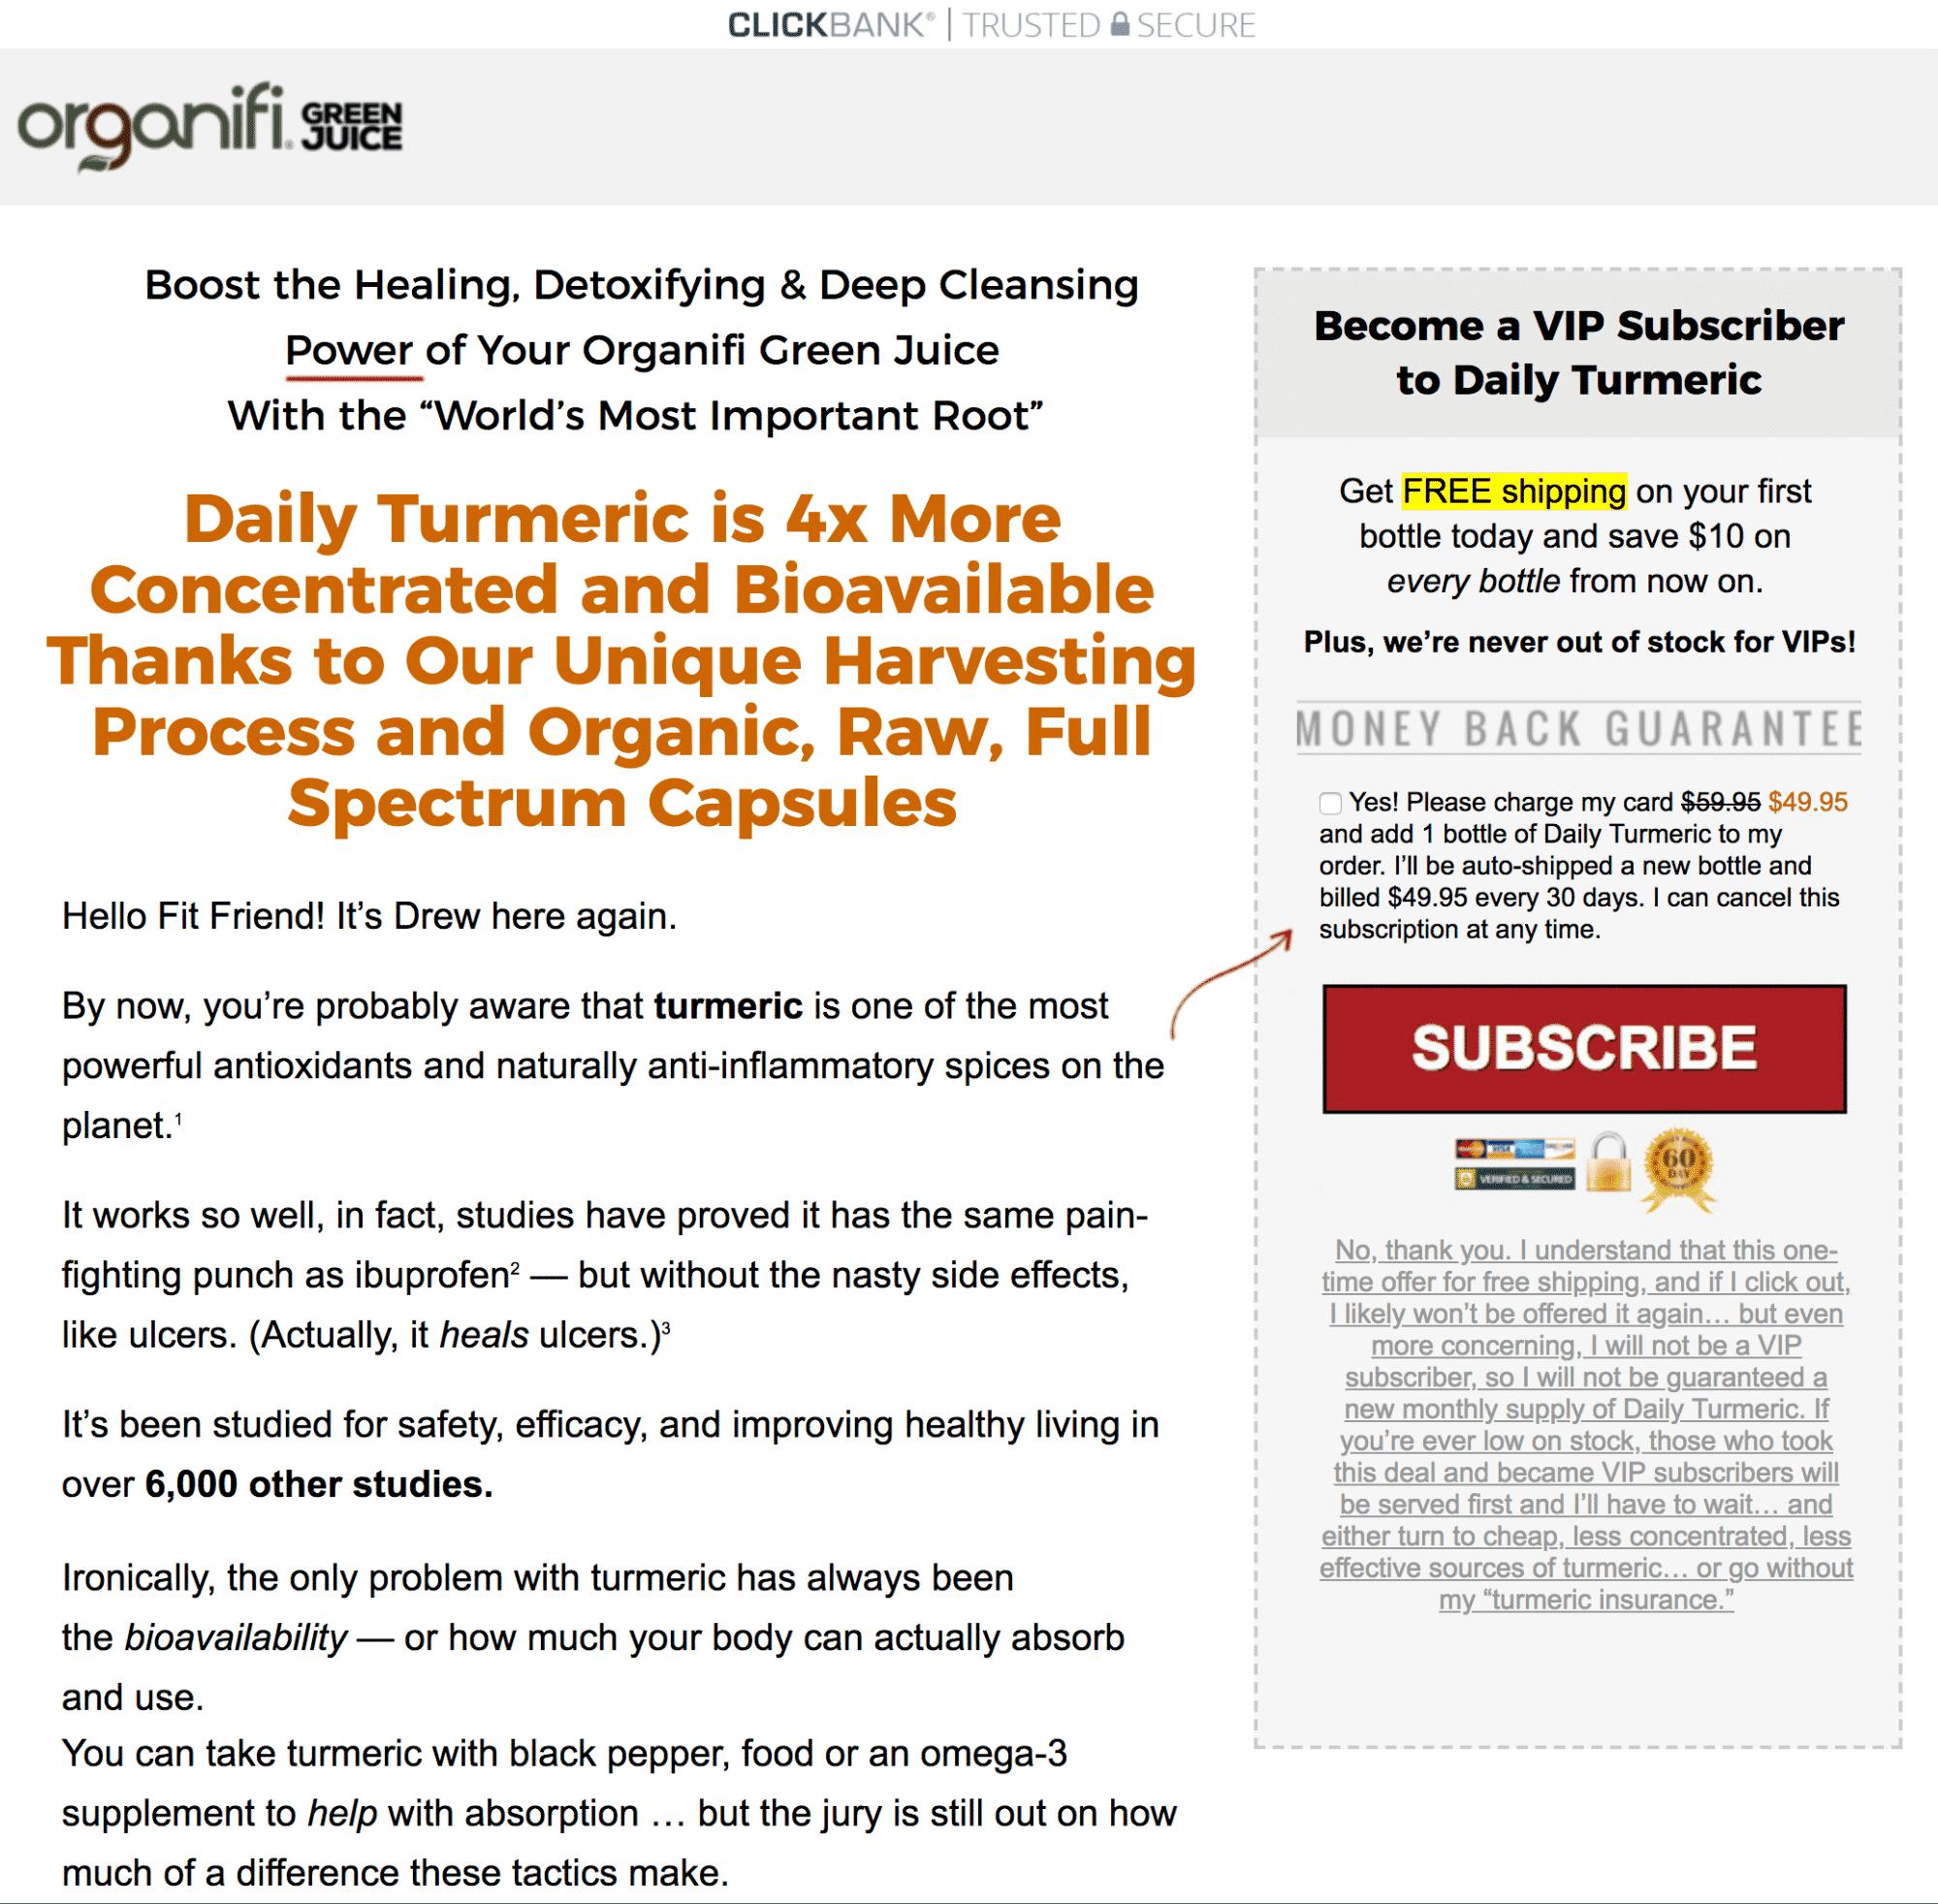 Organifi subscription upsell